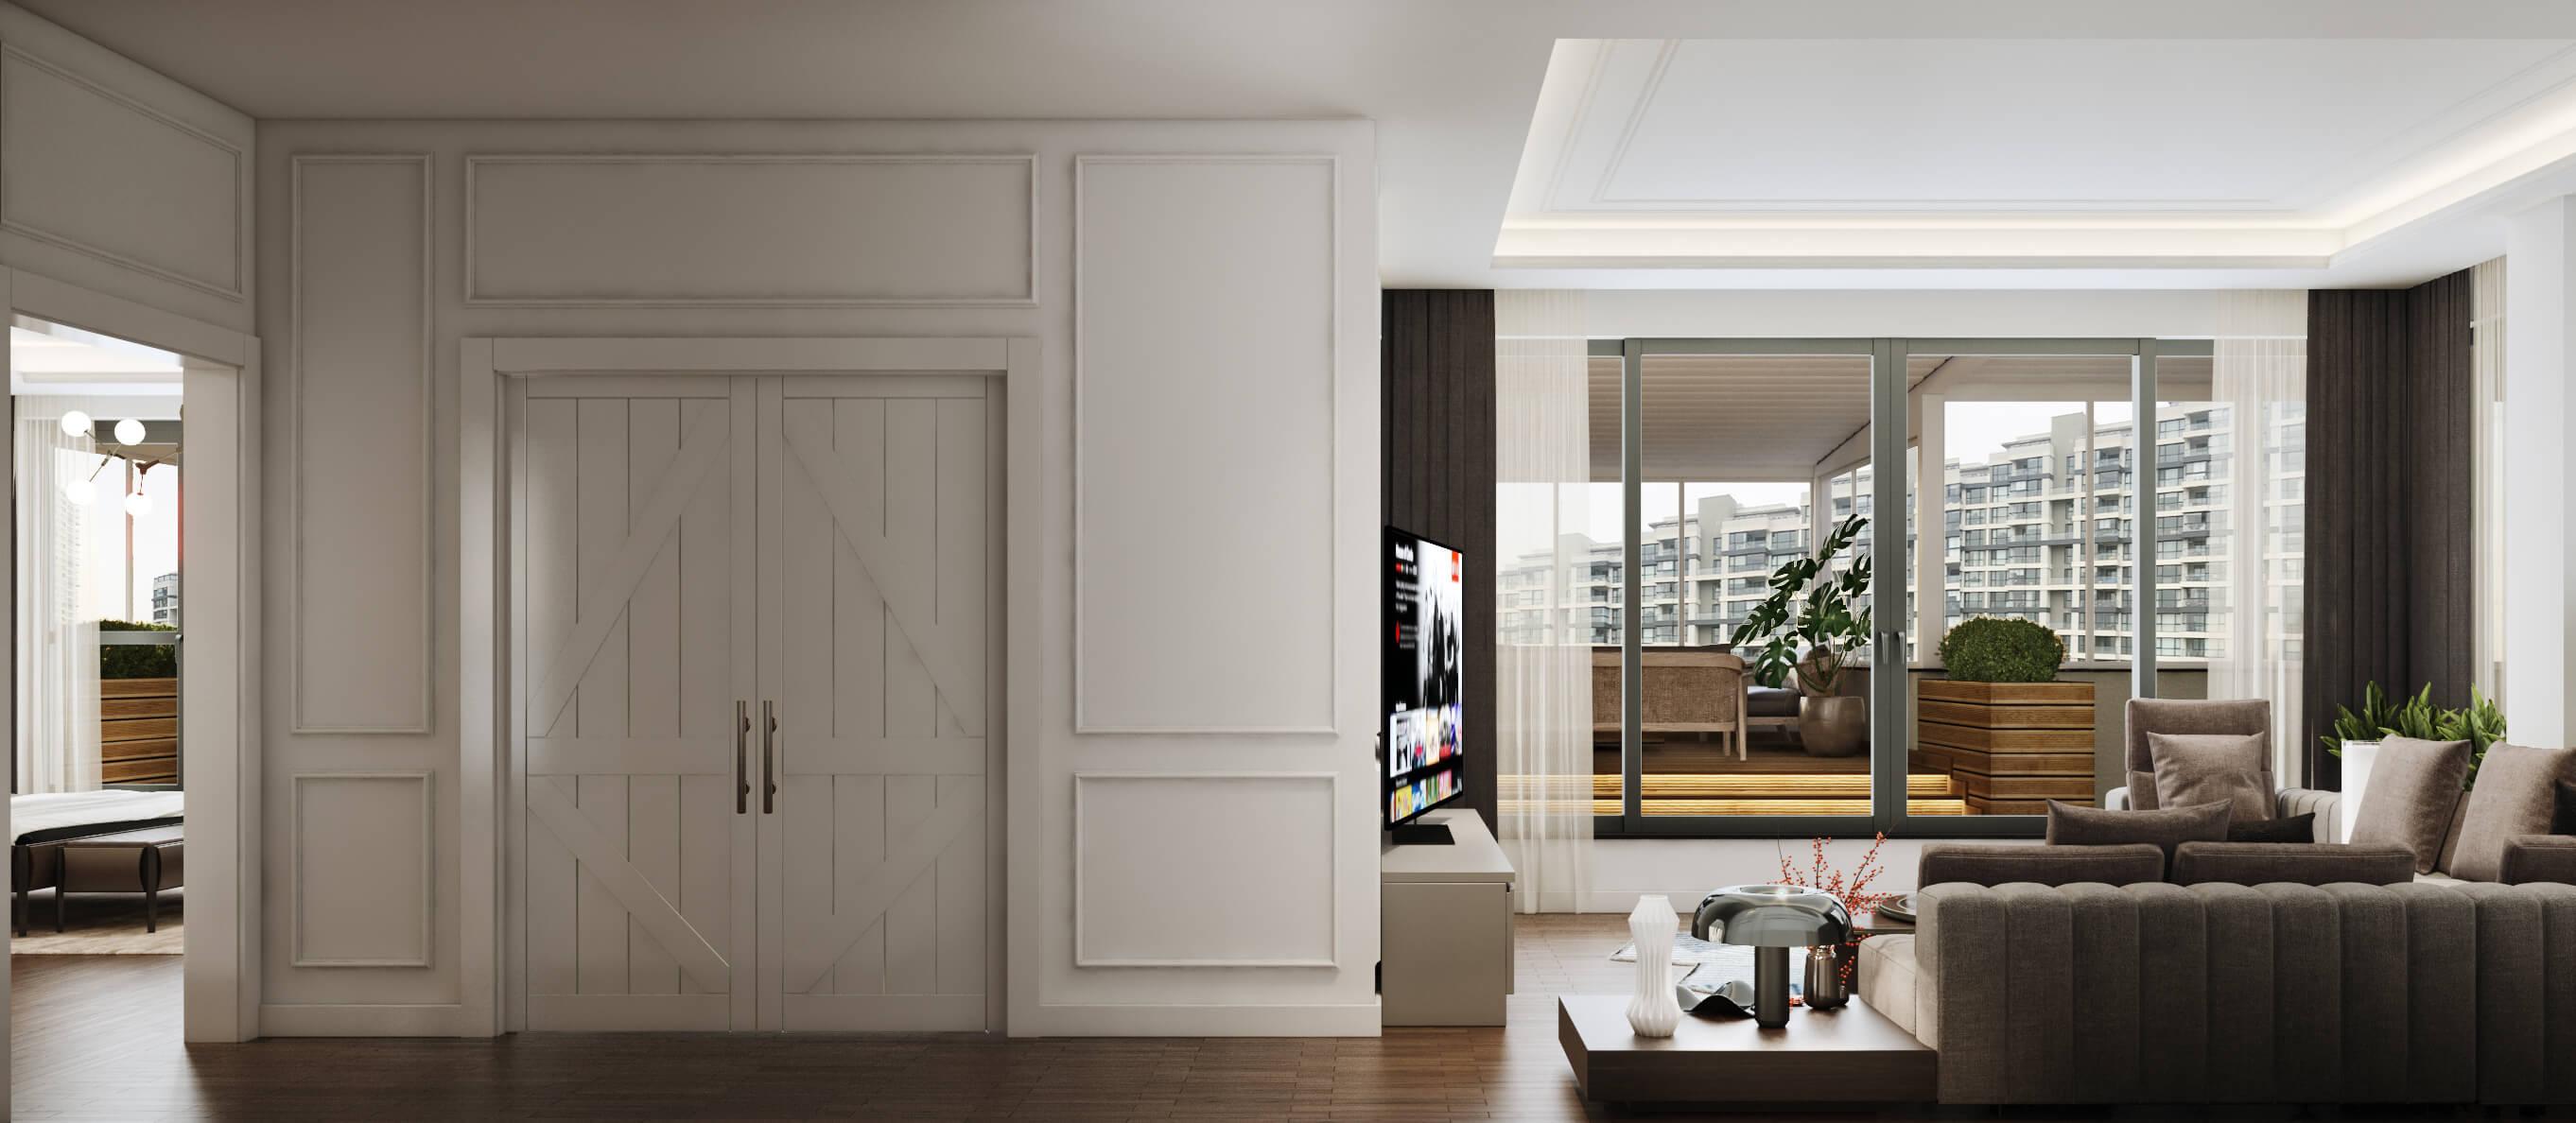 4492 Incek Prestij Dublex Apartment Residential